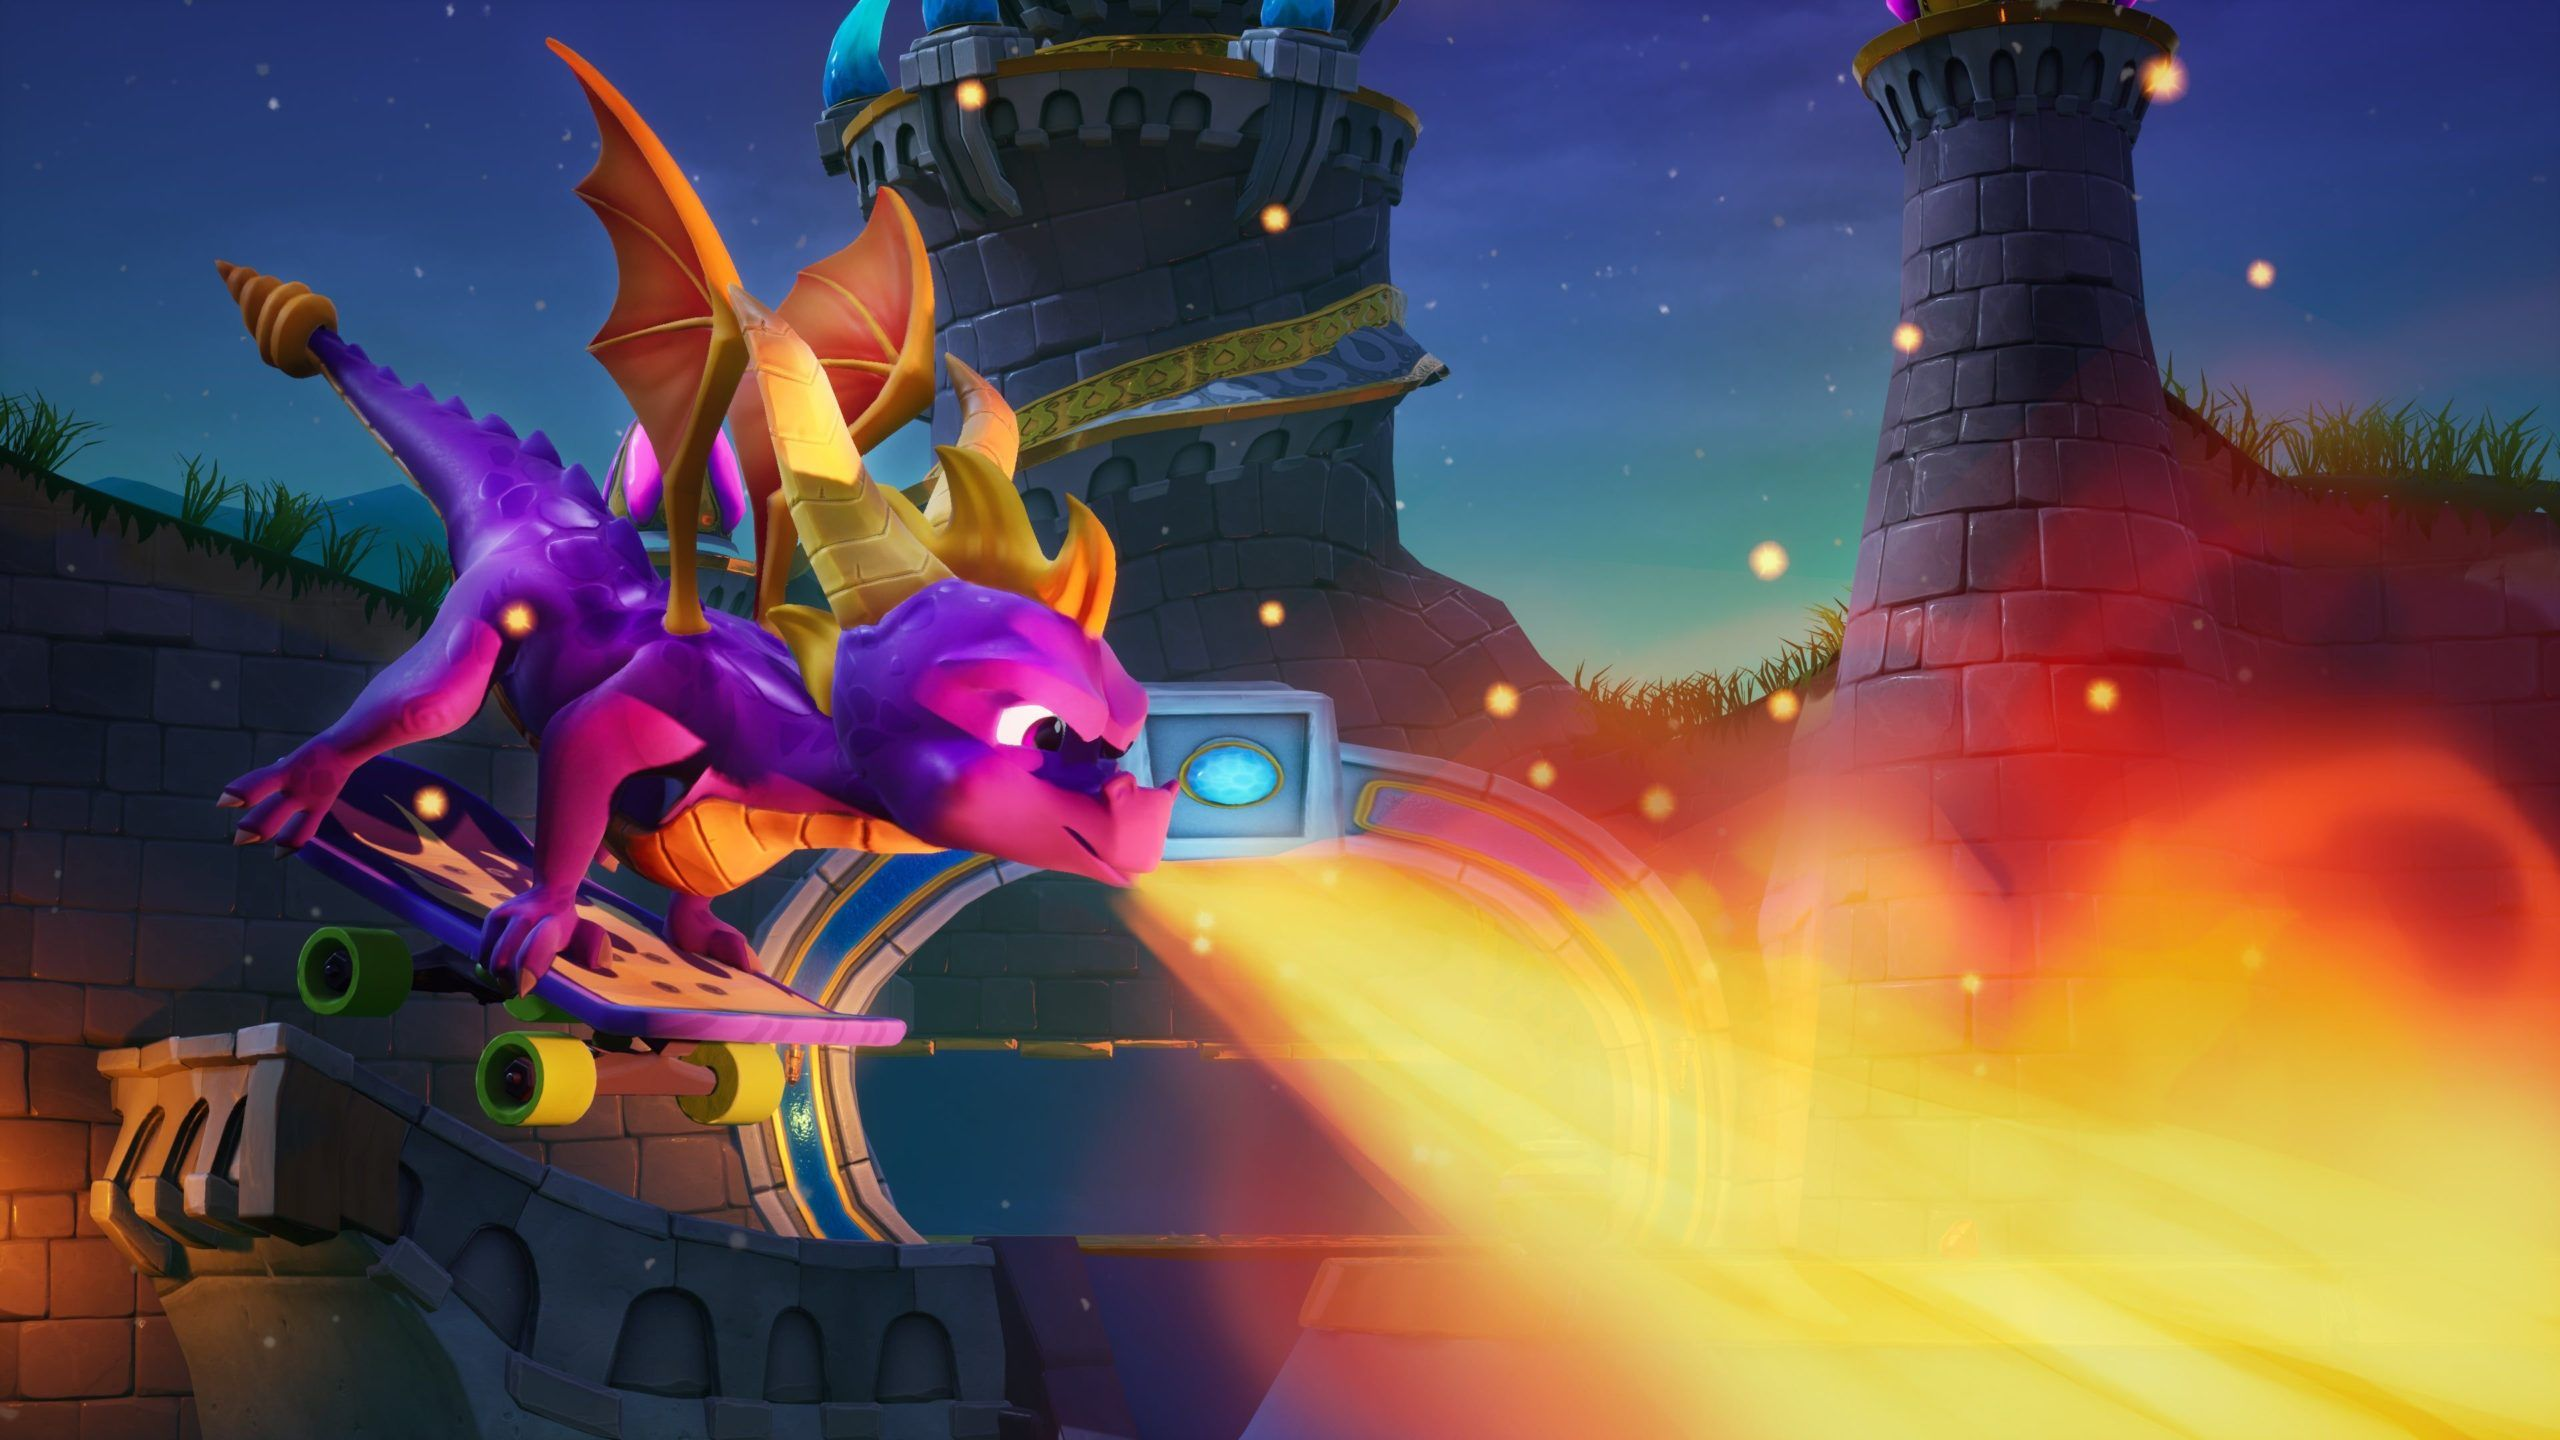 Spyro Reignited Wallpaper Spyro The Dragon Trilogy